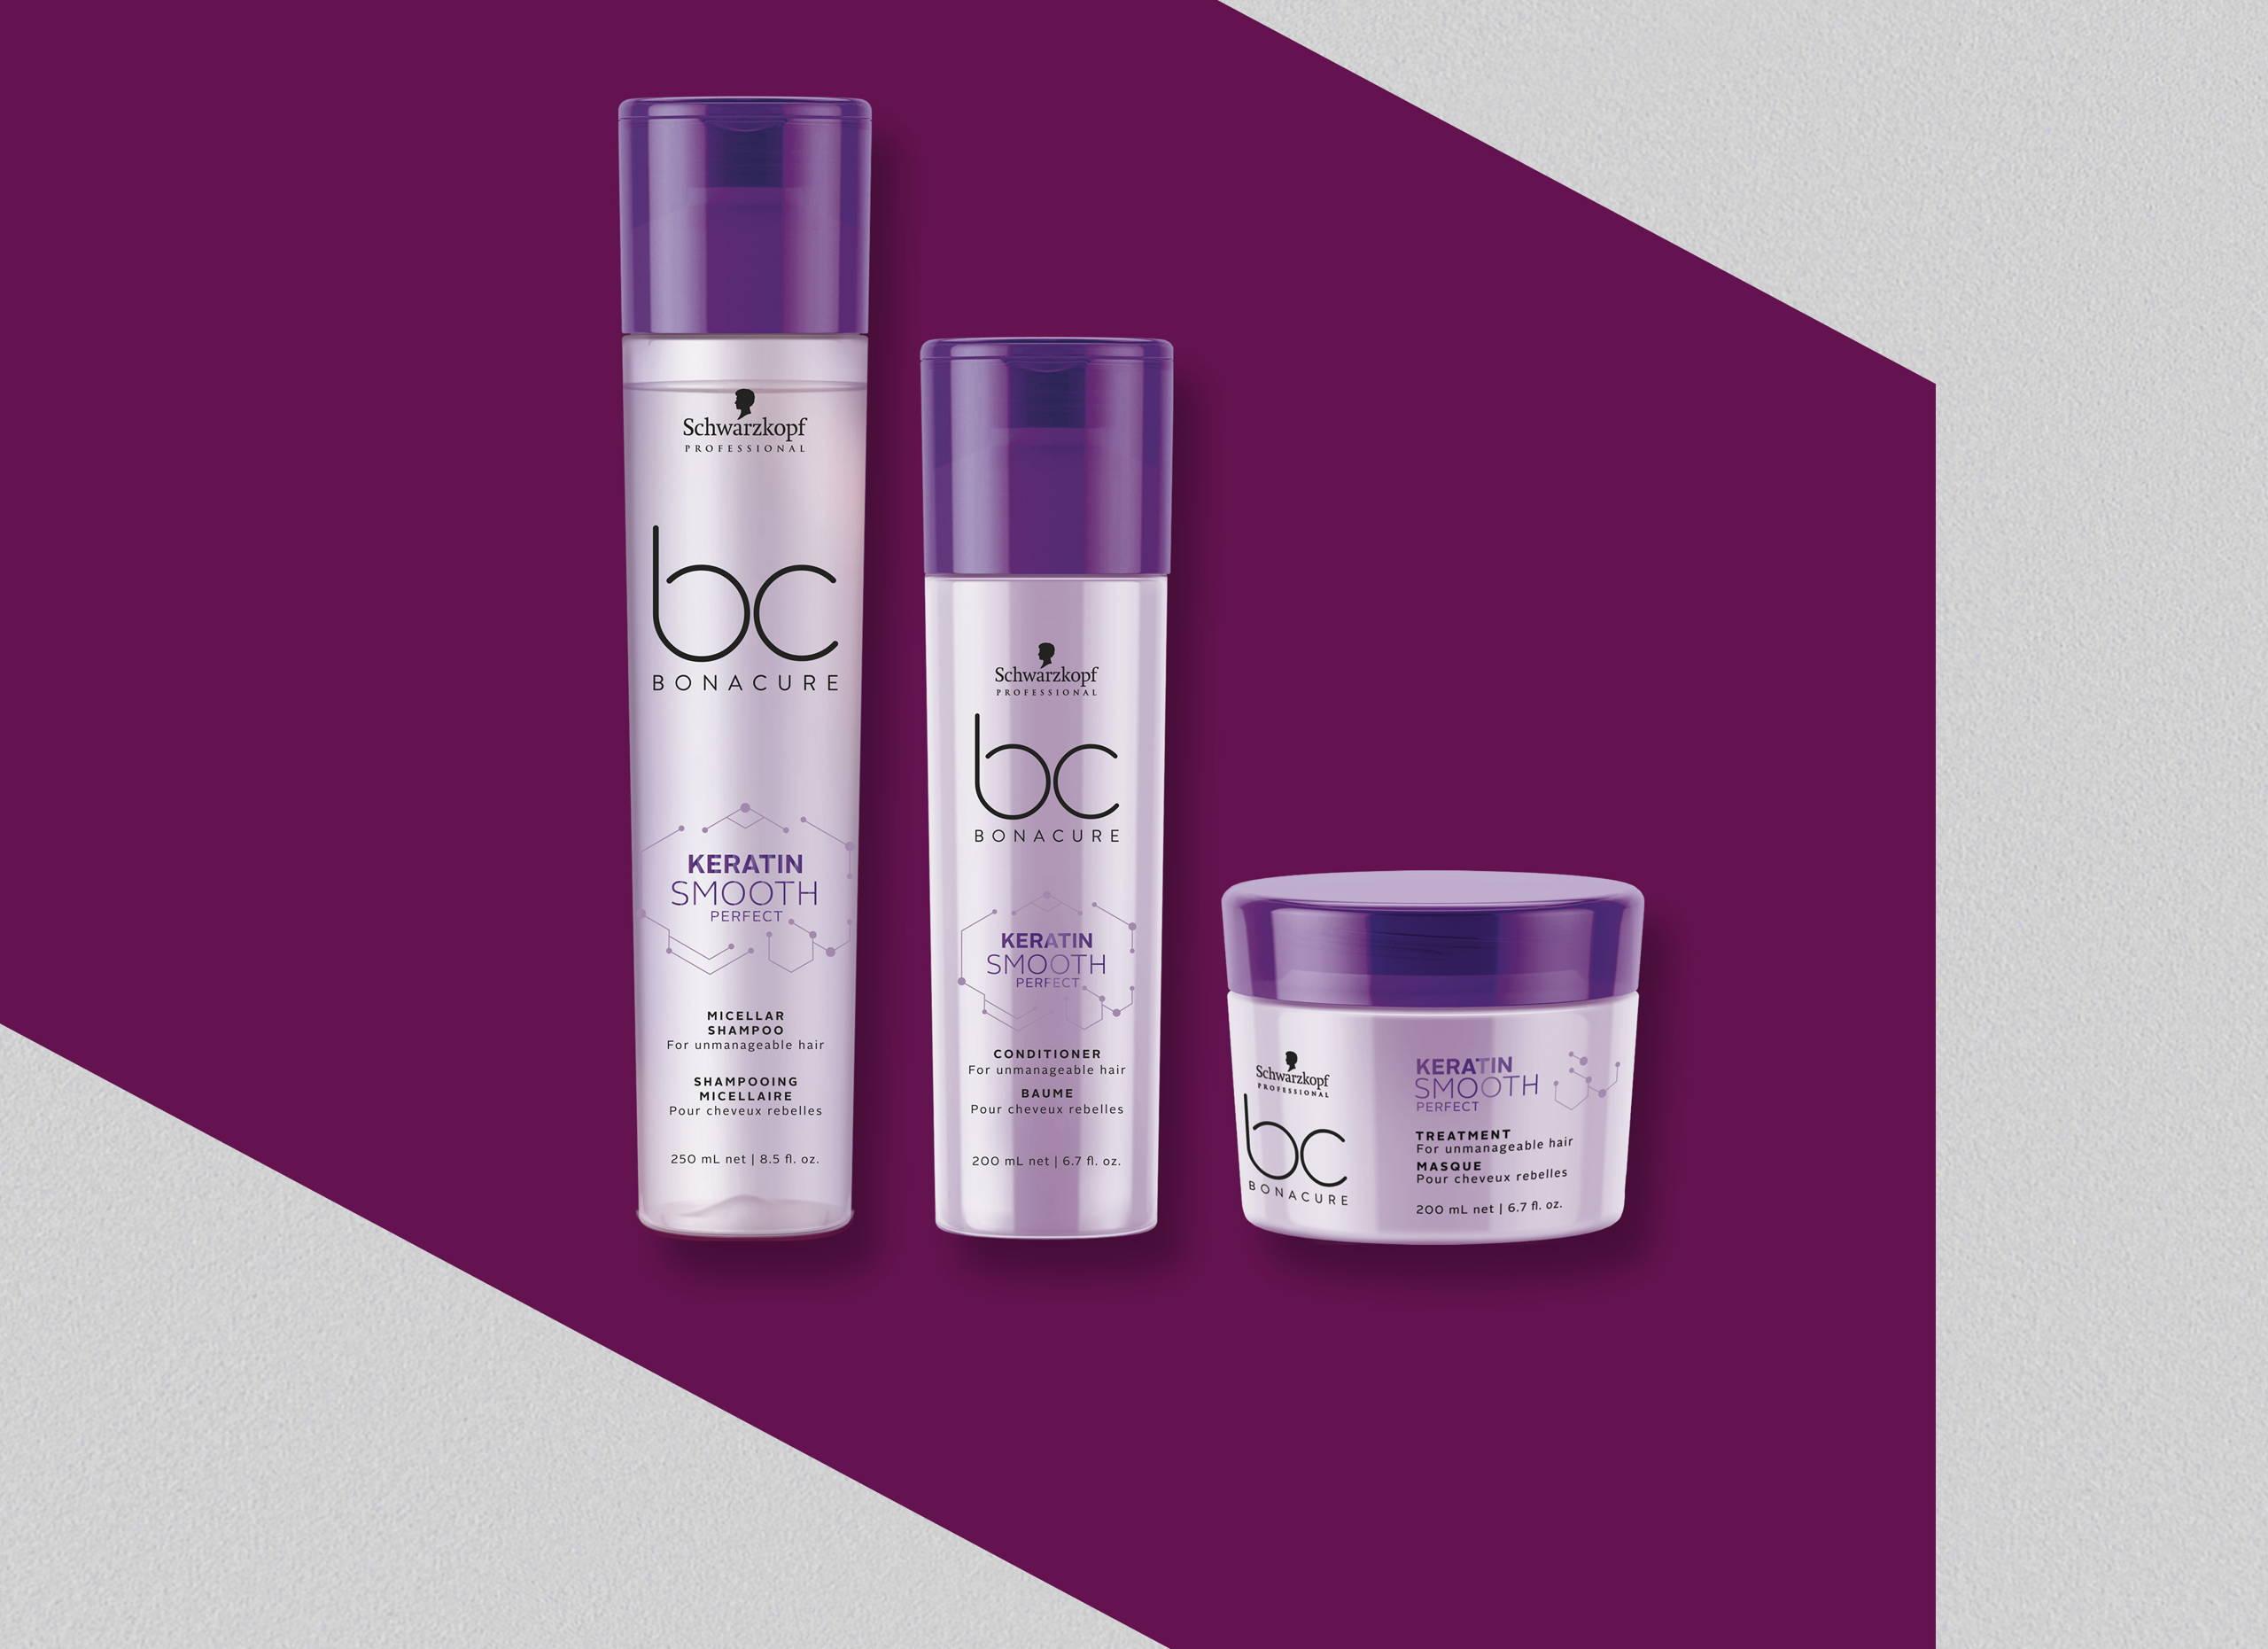 BC Keratin Smooth Perfect | Schwarzkopf Professional | retailbox.co.za